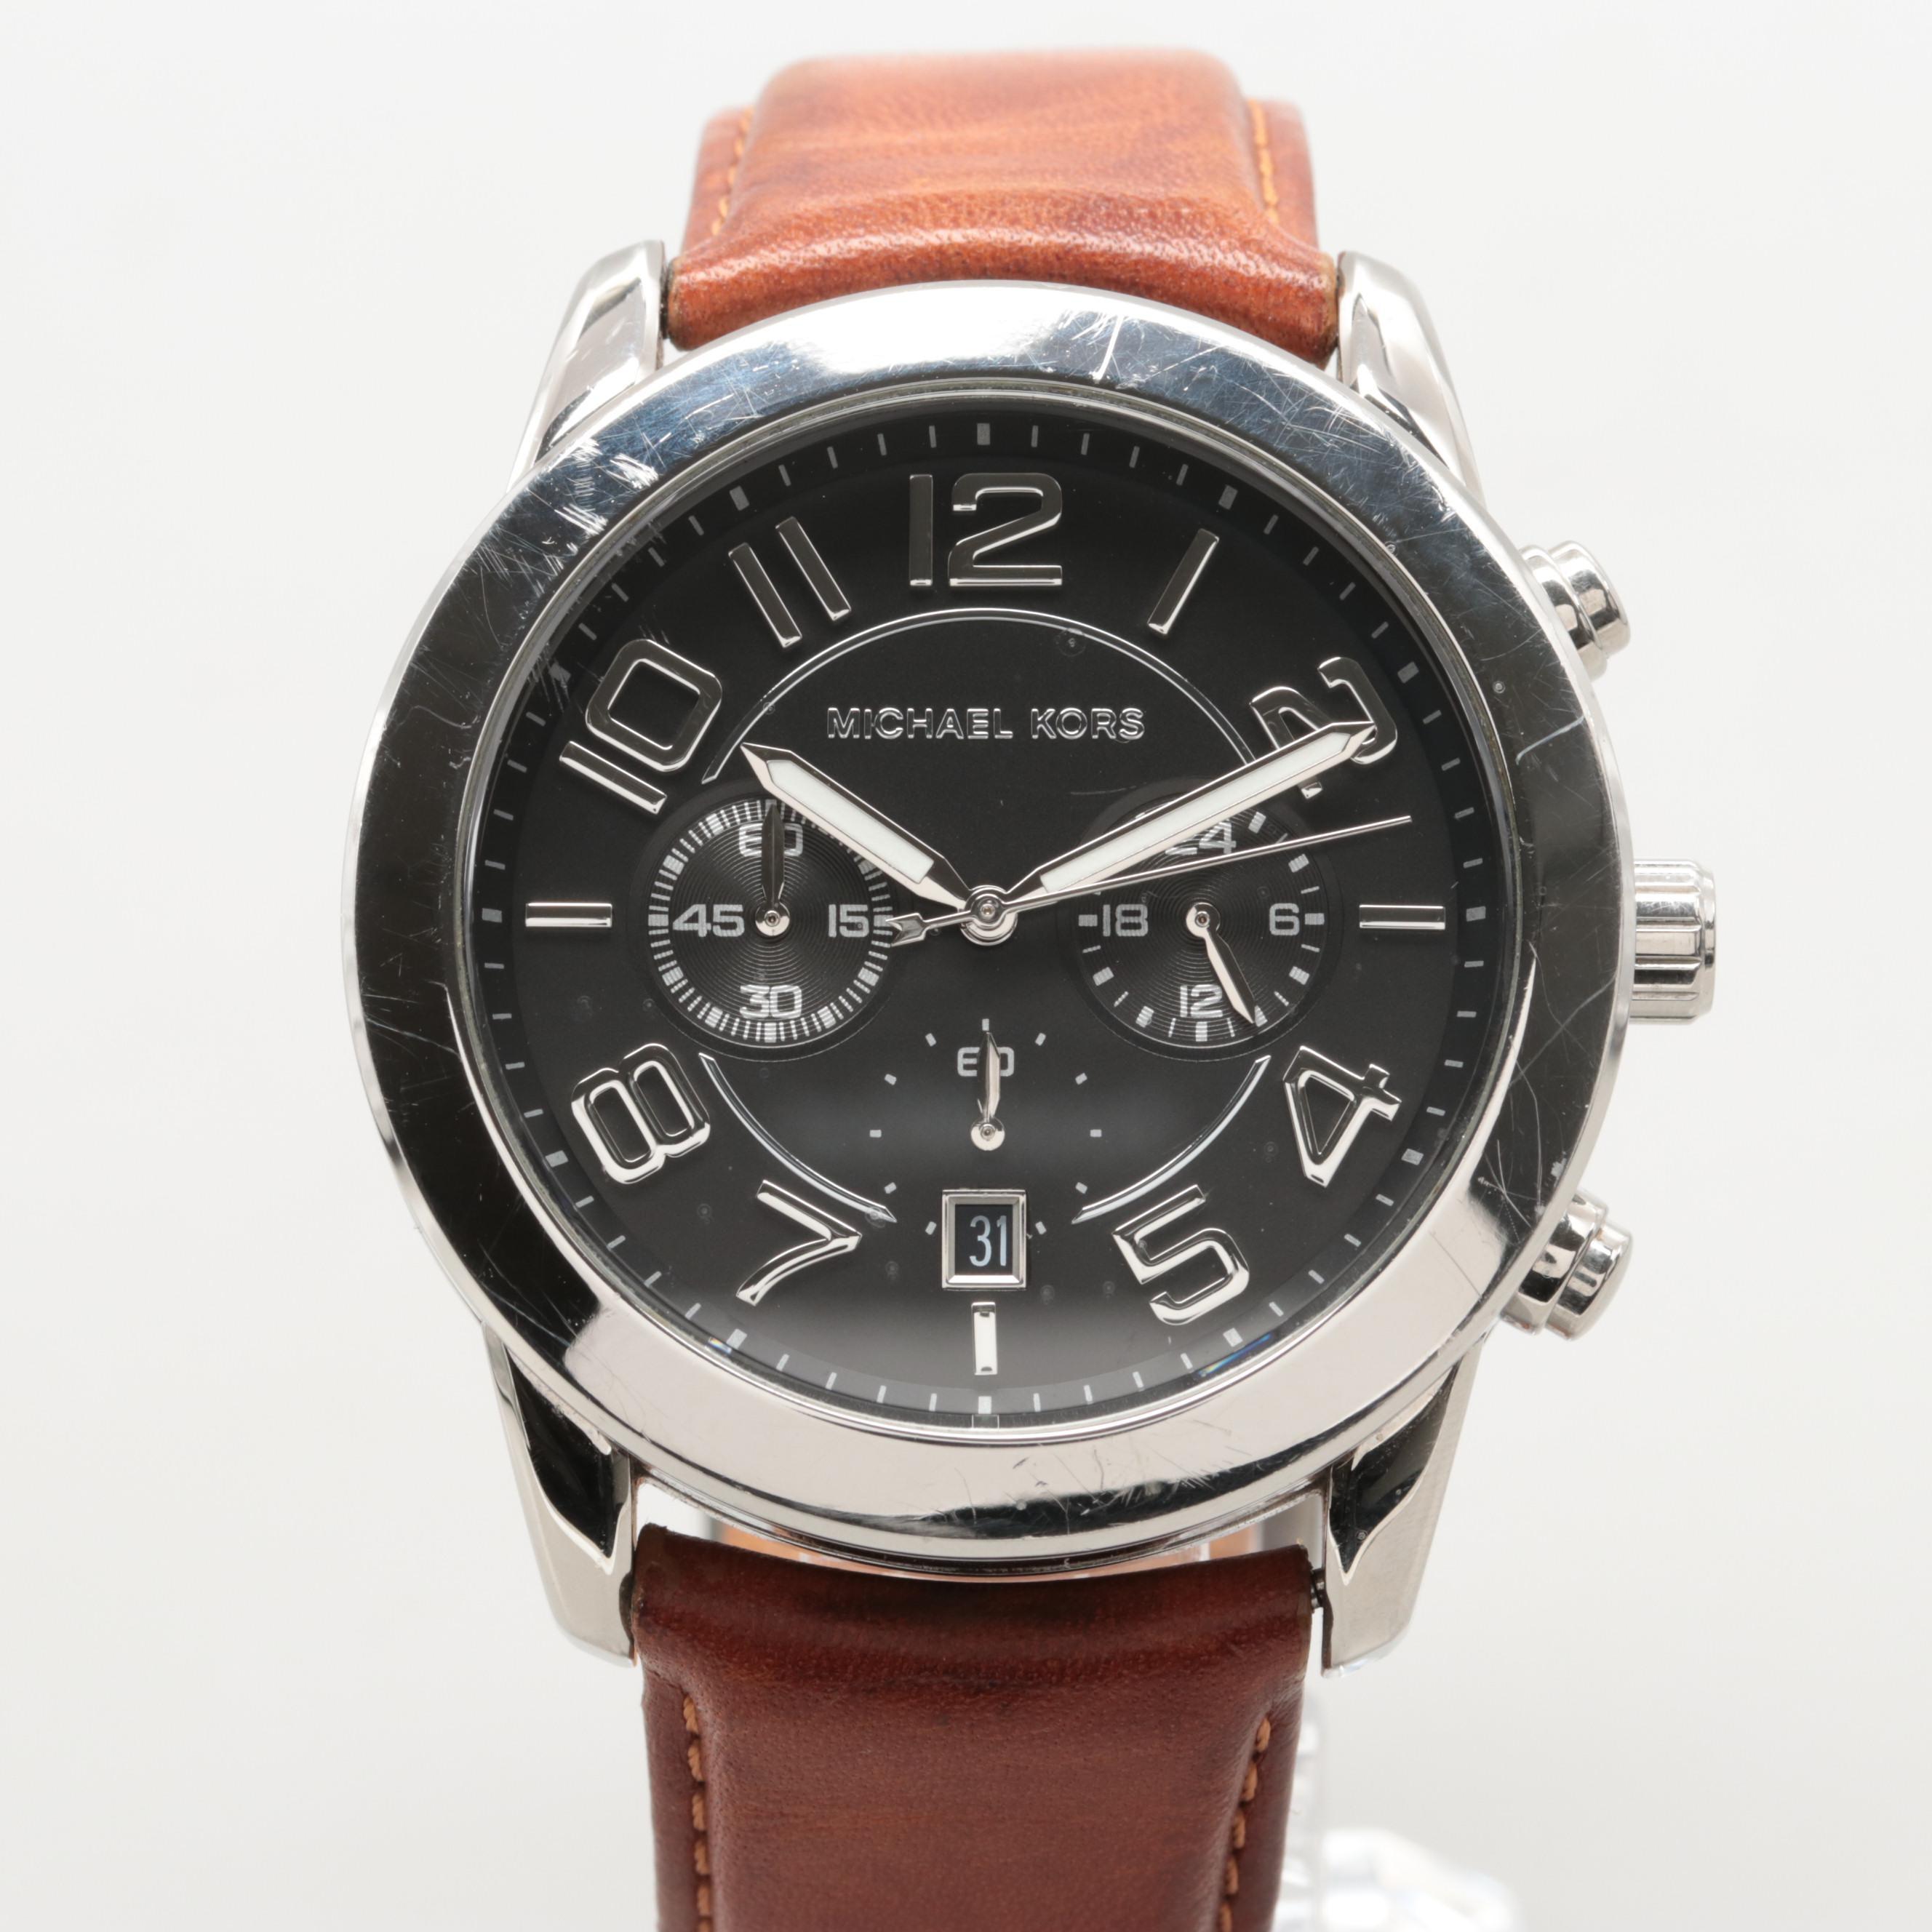 Michael Kors MK-8359 Quartz Chronograph Wristwatch